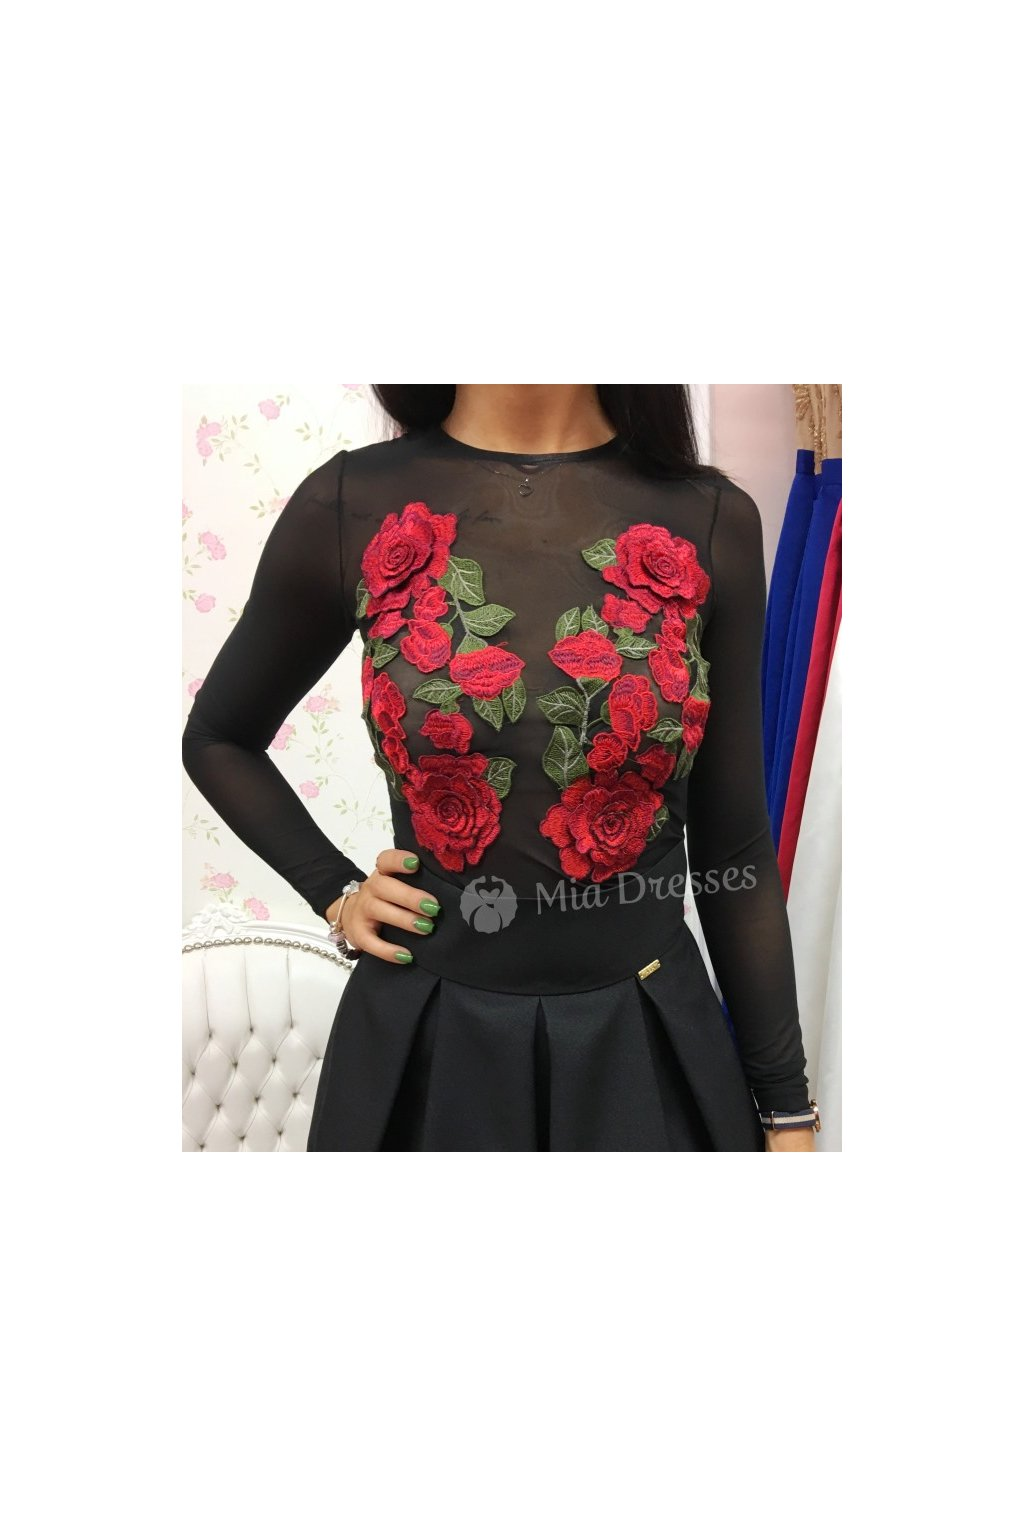 Čierny top s ružami